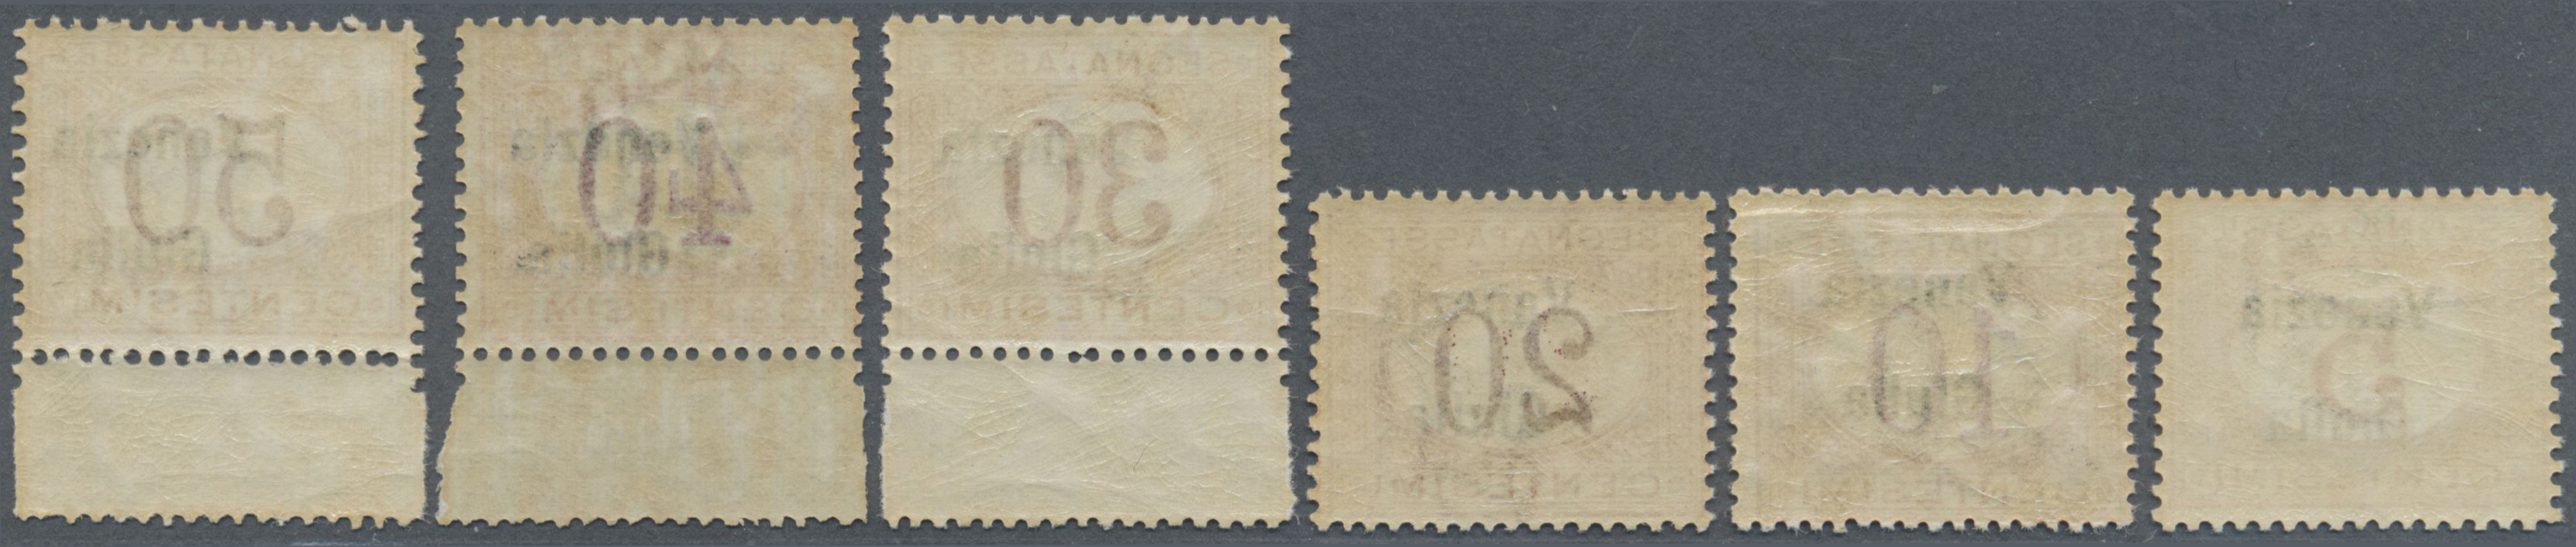 Lot 17132 - Italienische Besetzung 1918/23 - Julisch-Venetien - Portomarken  -  Auktionshaus Christoph Gärtner GmbH & Co. KG Single lots Philately Overseas & Europe. Auction #39 Day 4